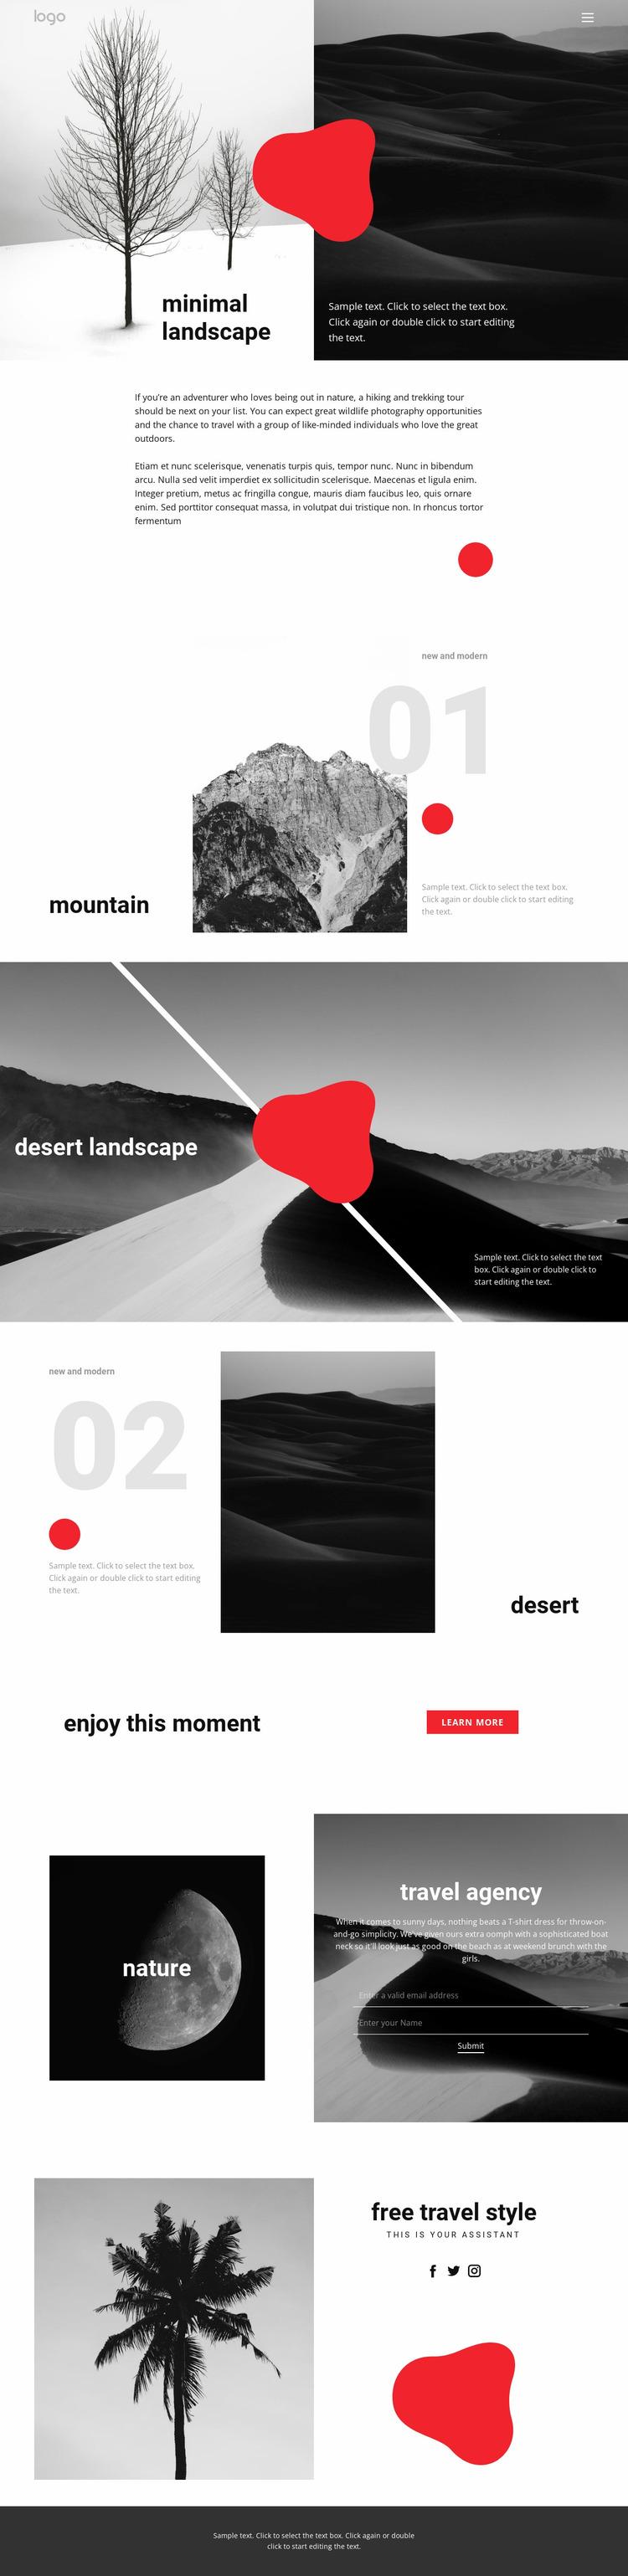 Minimal landscape photo Website Mockup